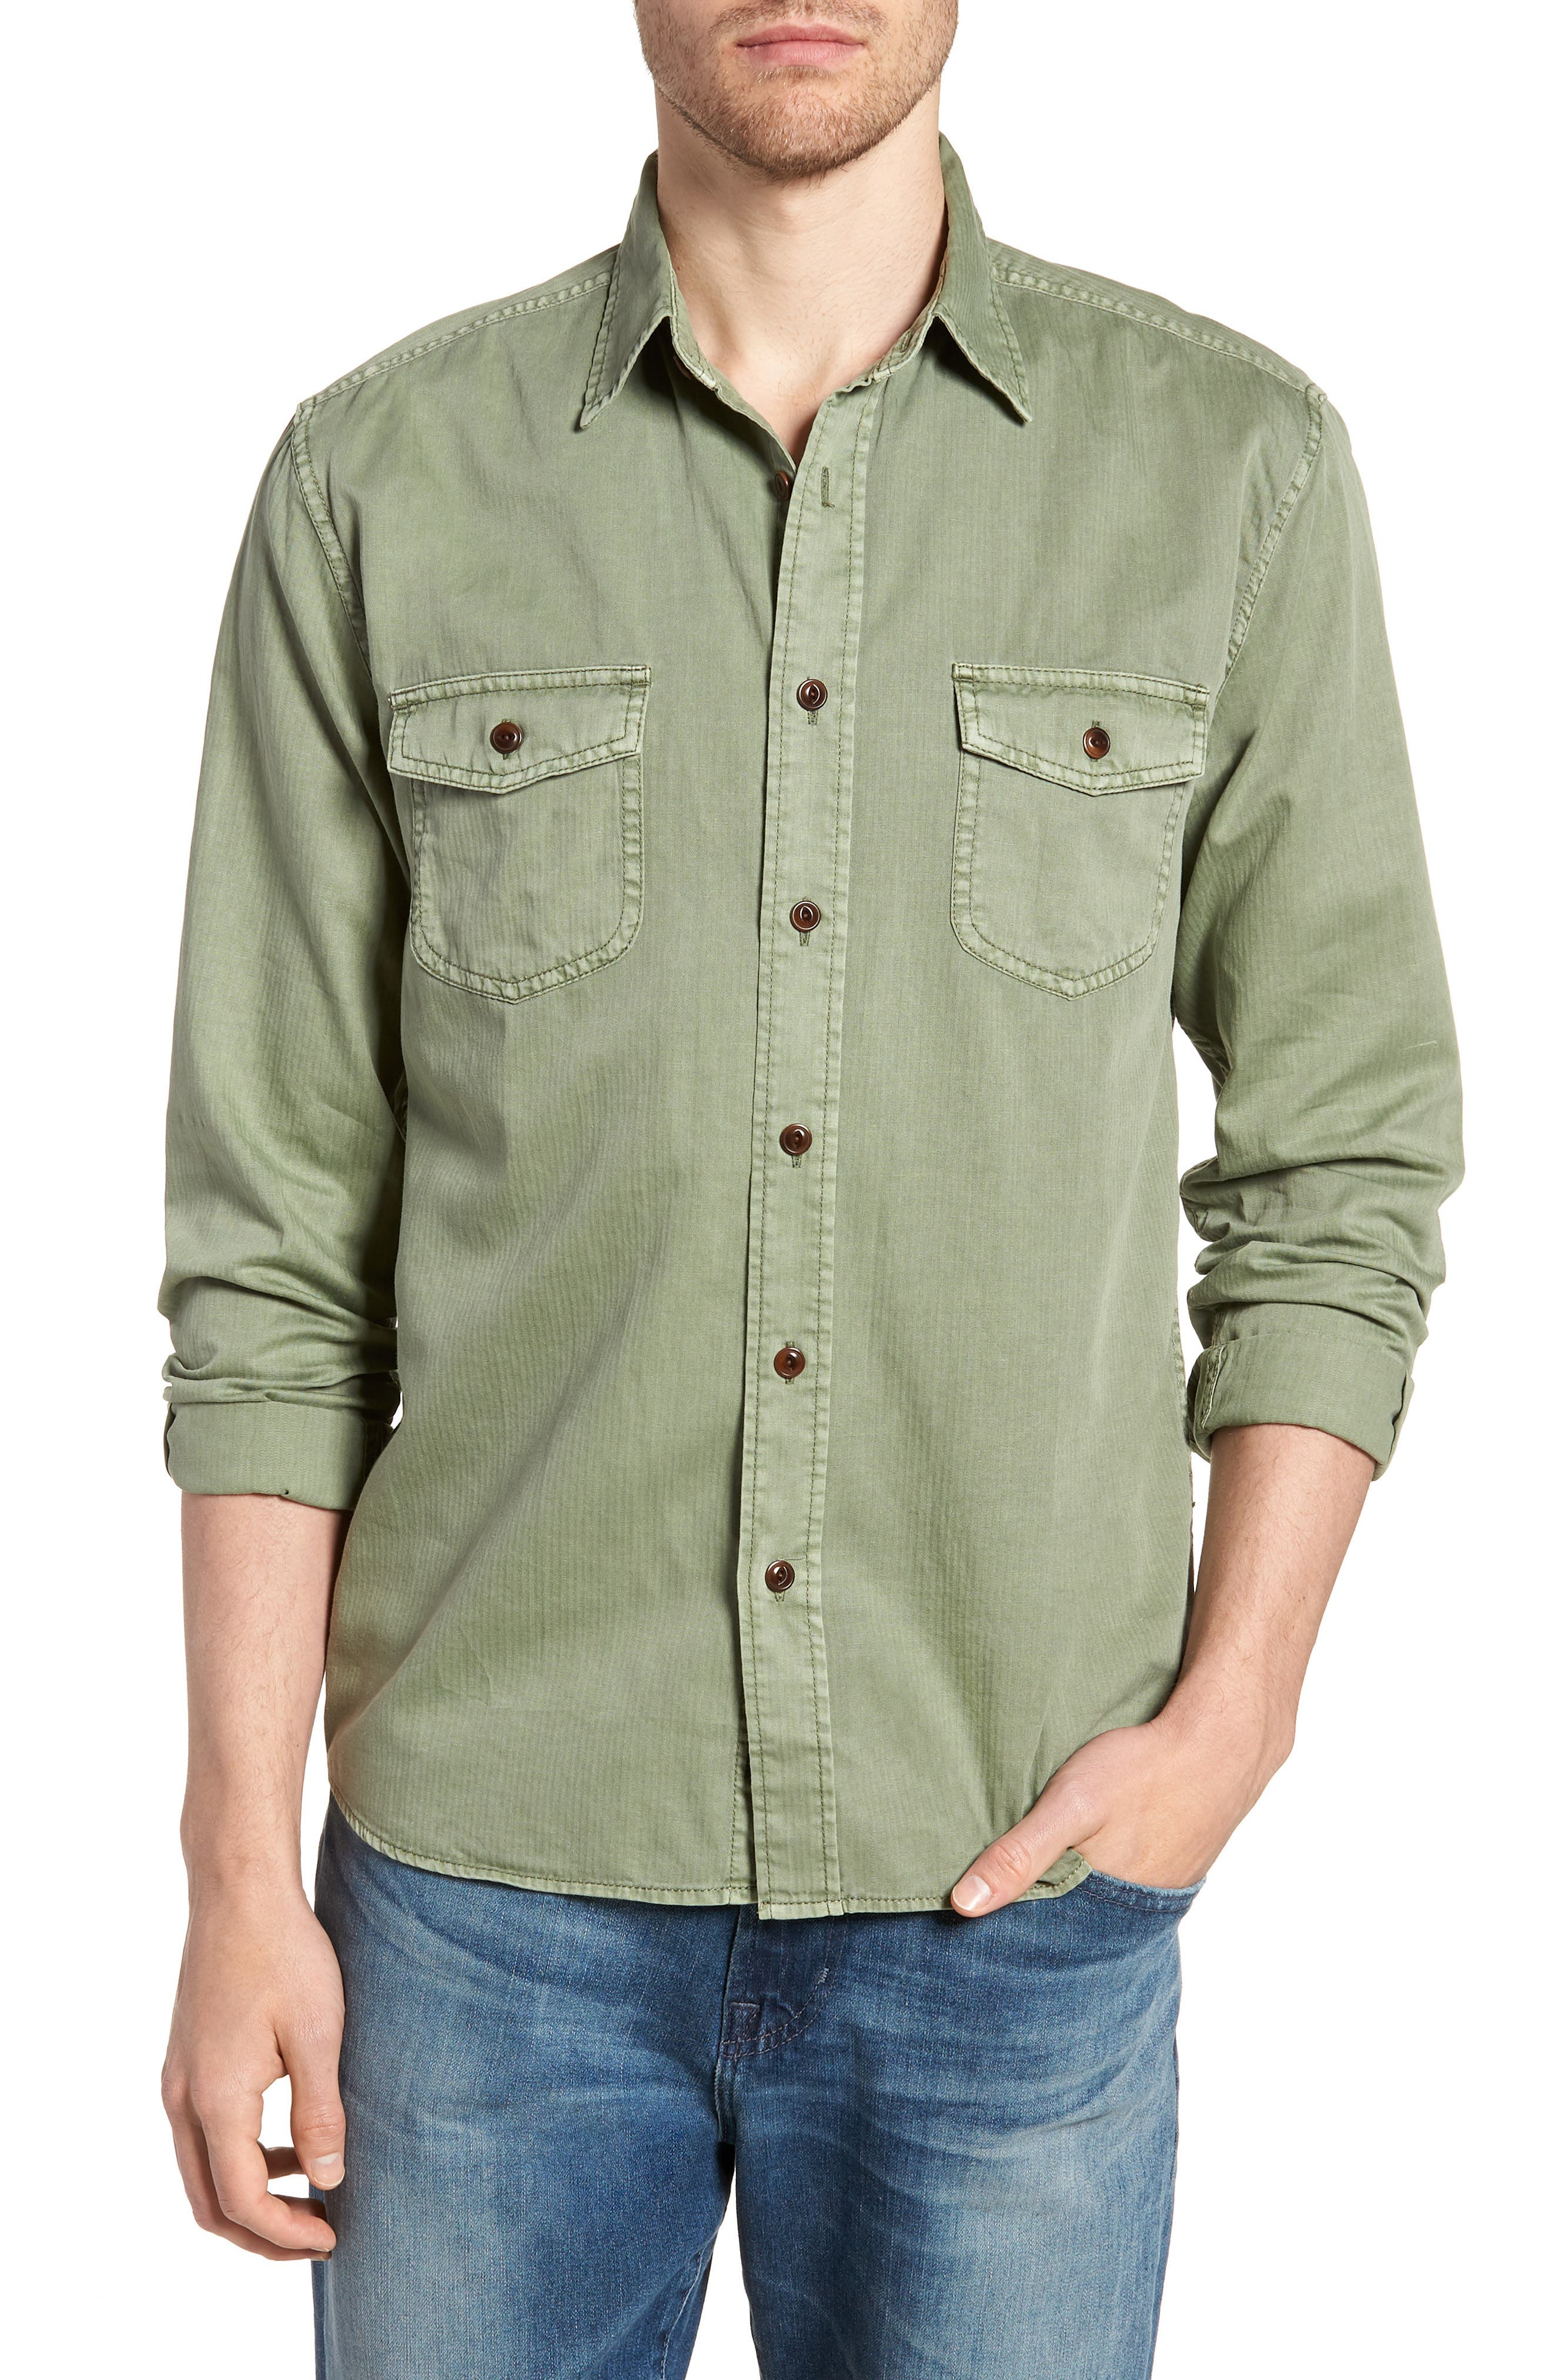 Radar Sport Shirt,                         Main,                         color, Olive